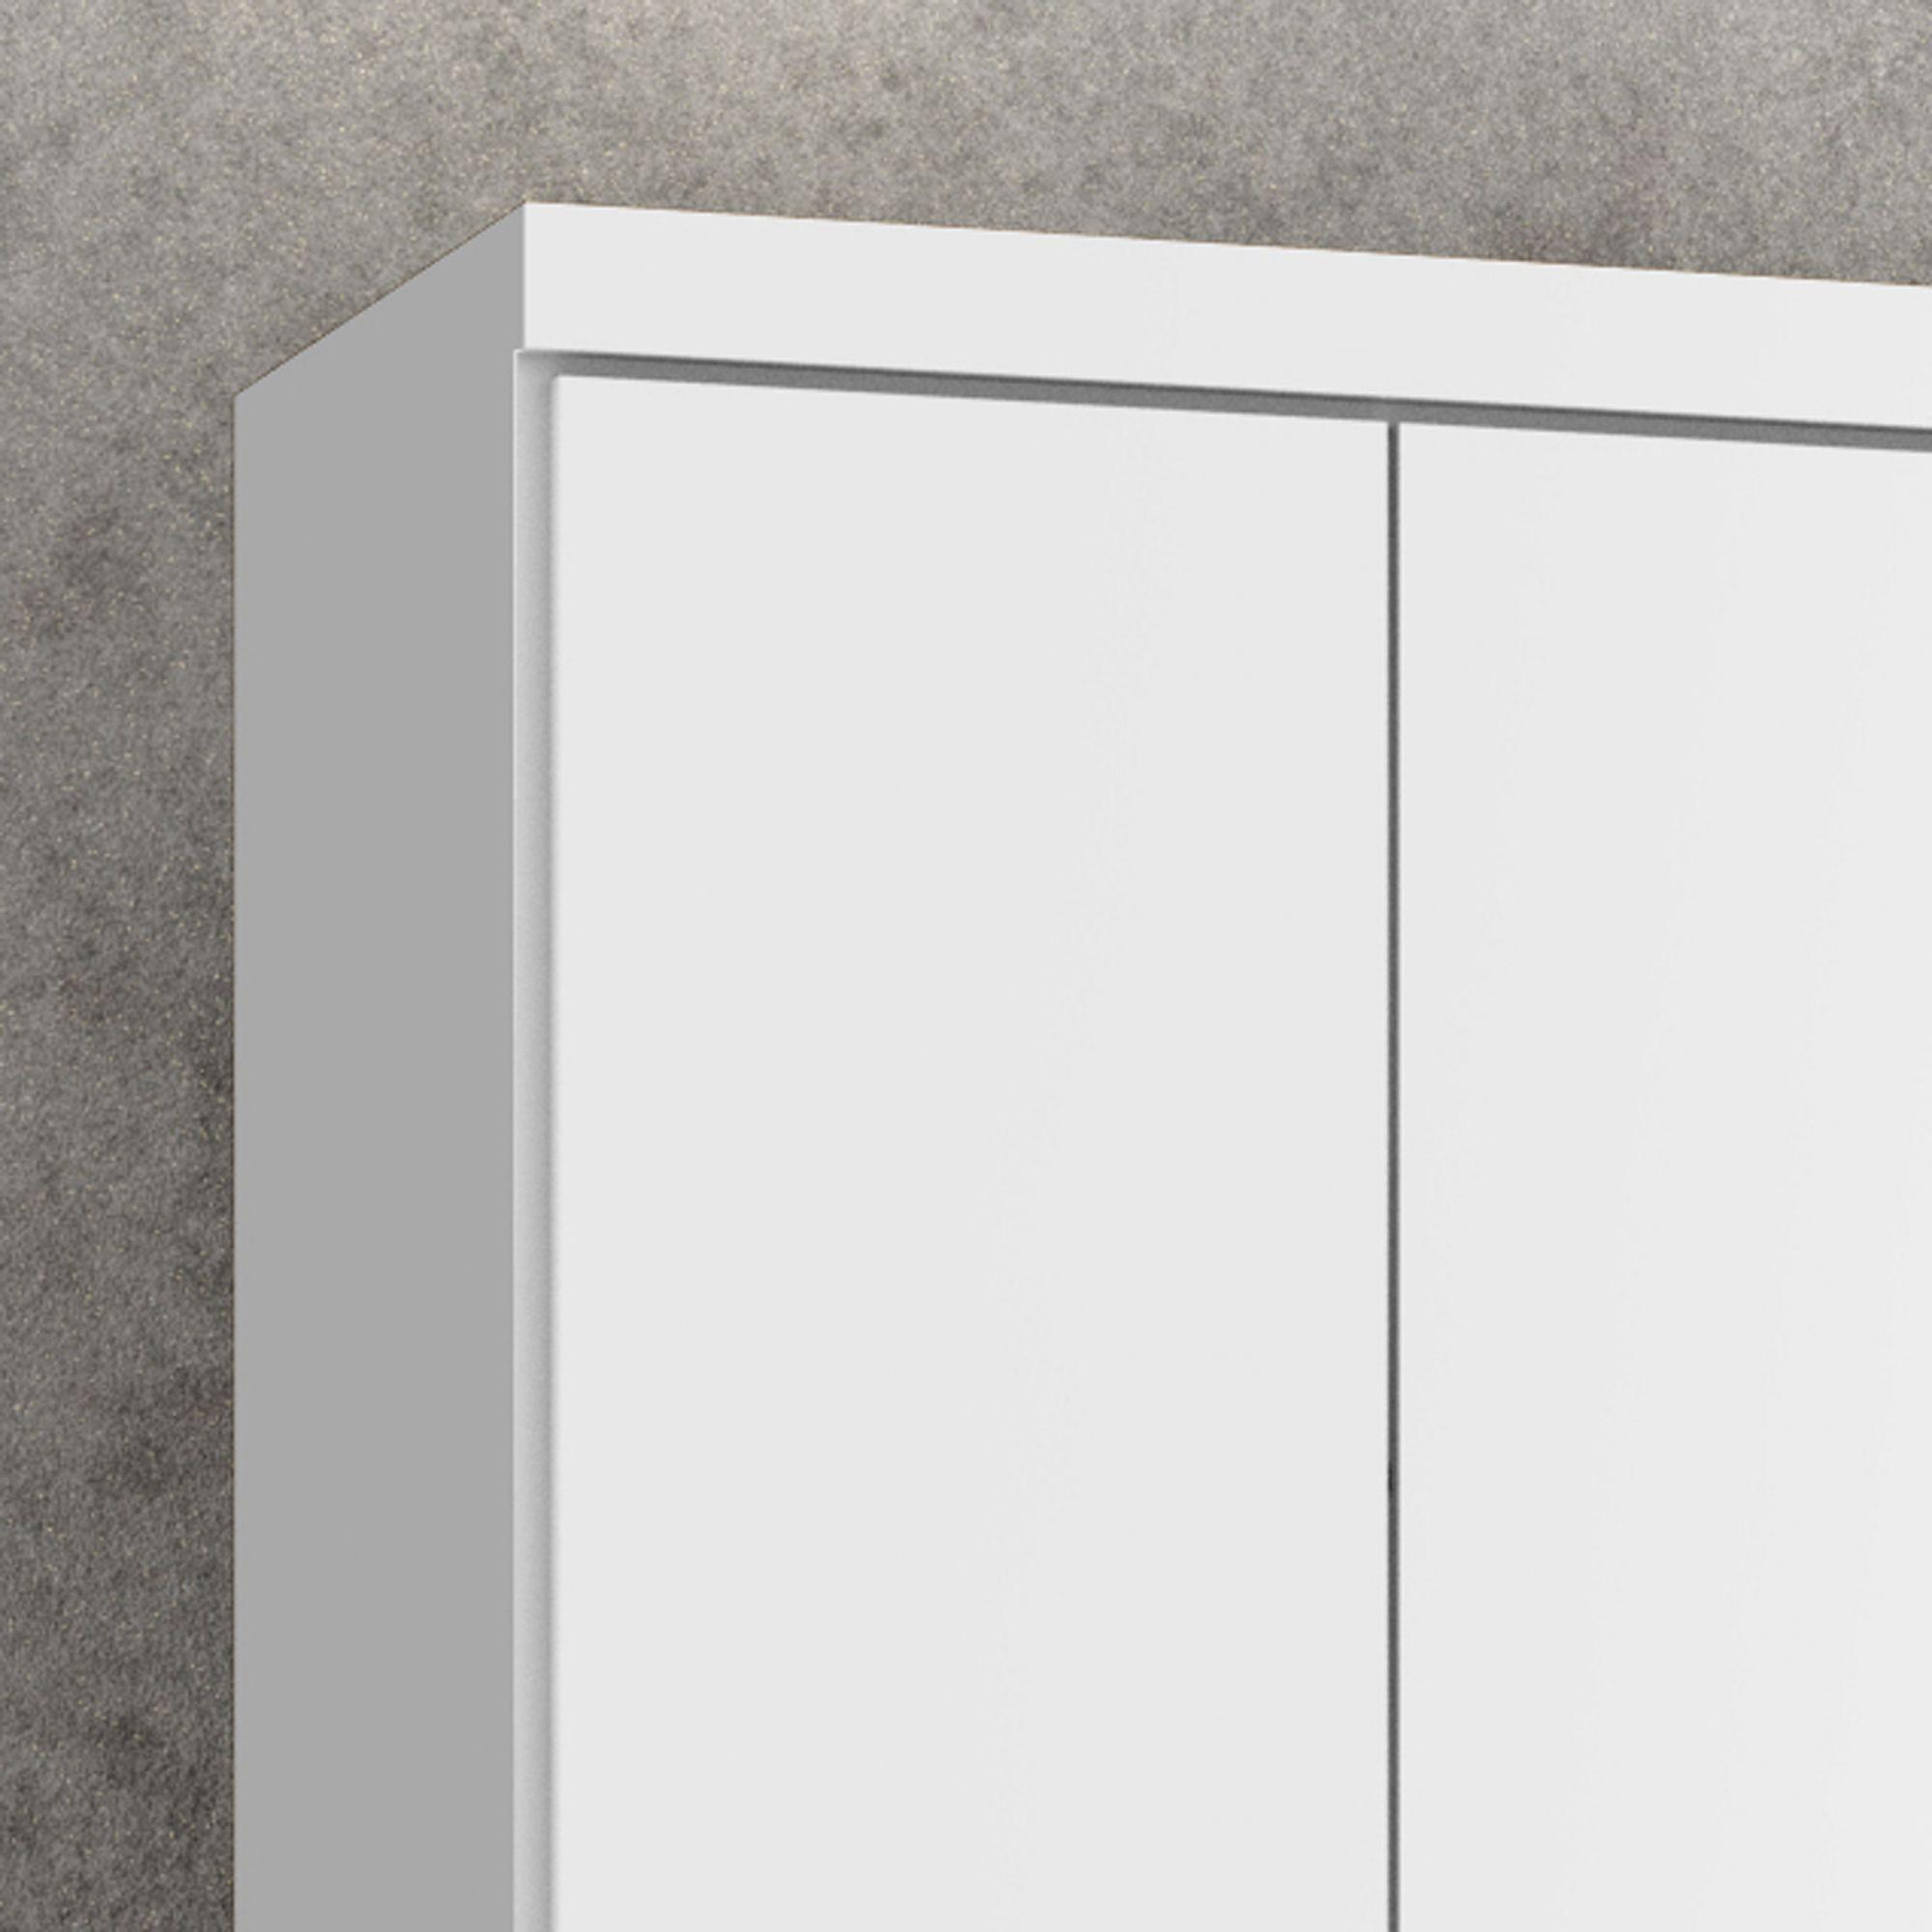 Guarda-Roupa Dallas 6 Portas Branco Acetinado - Germai Móveis